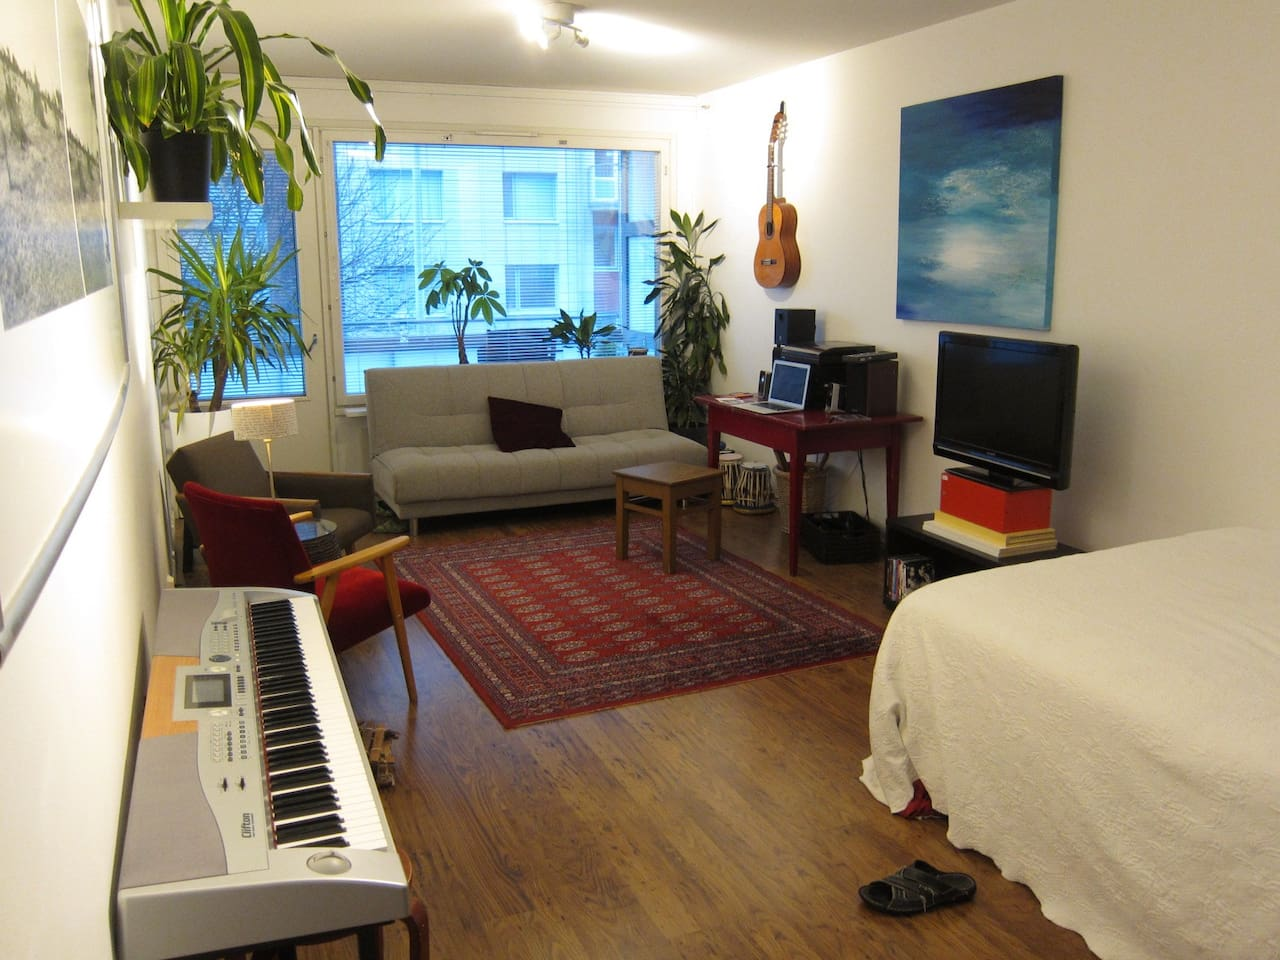 Living room and the balcony where smoking is ok.